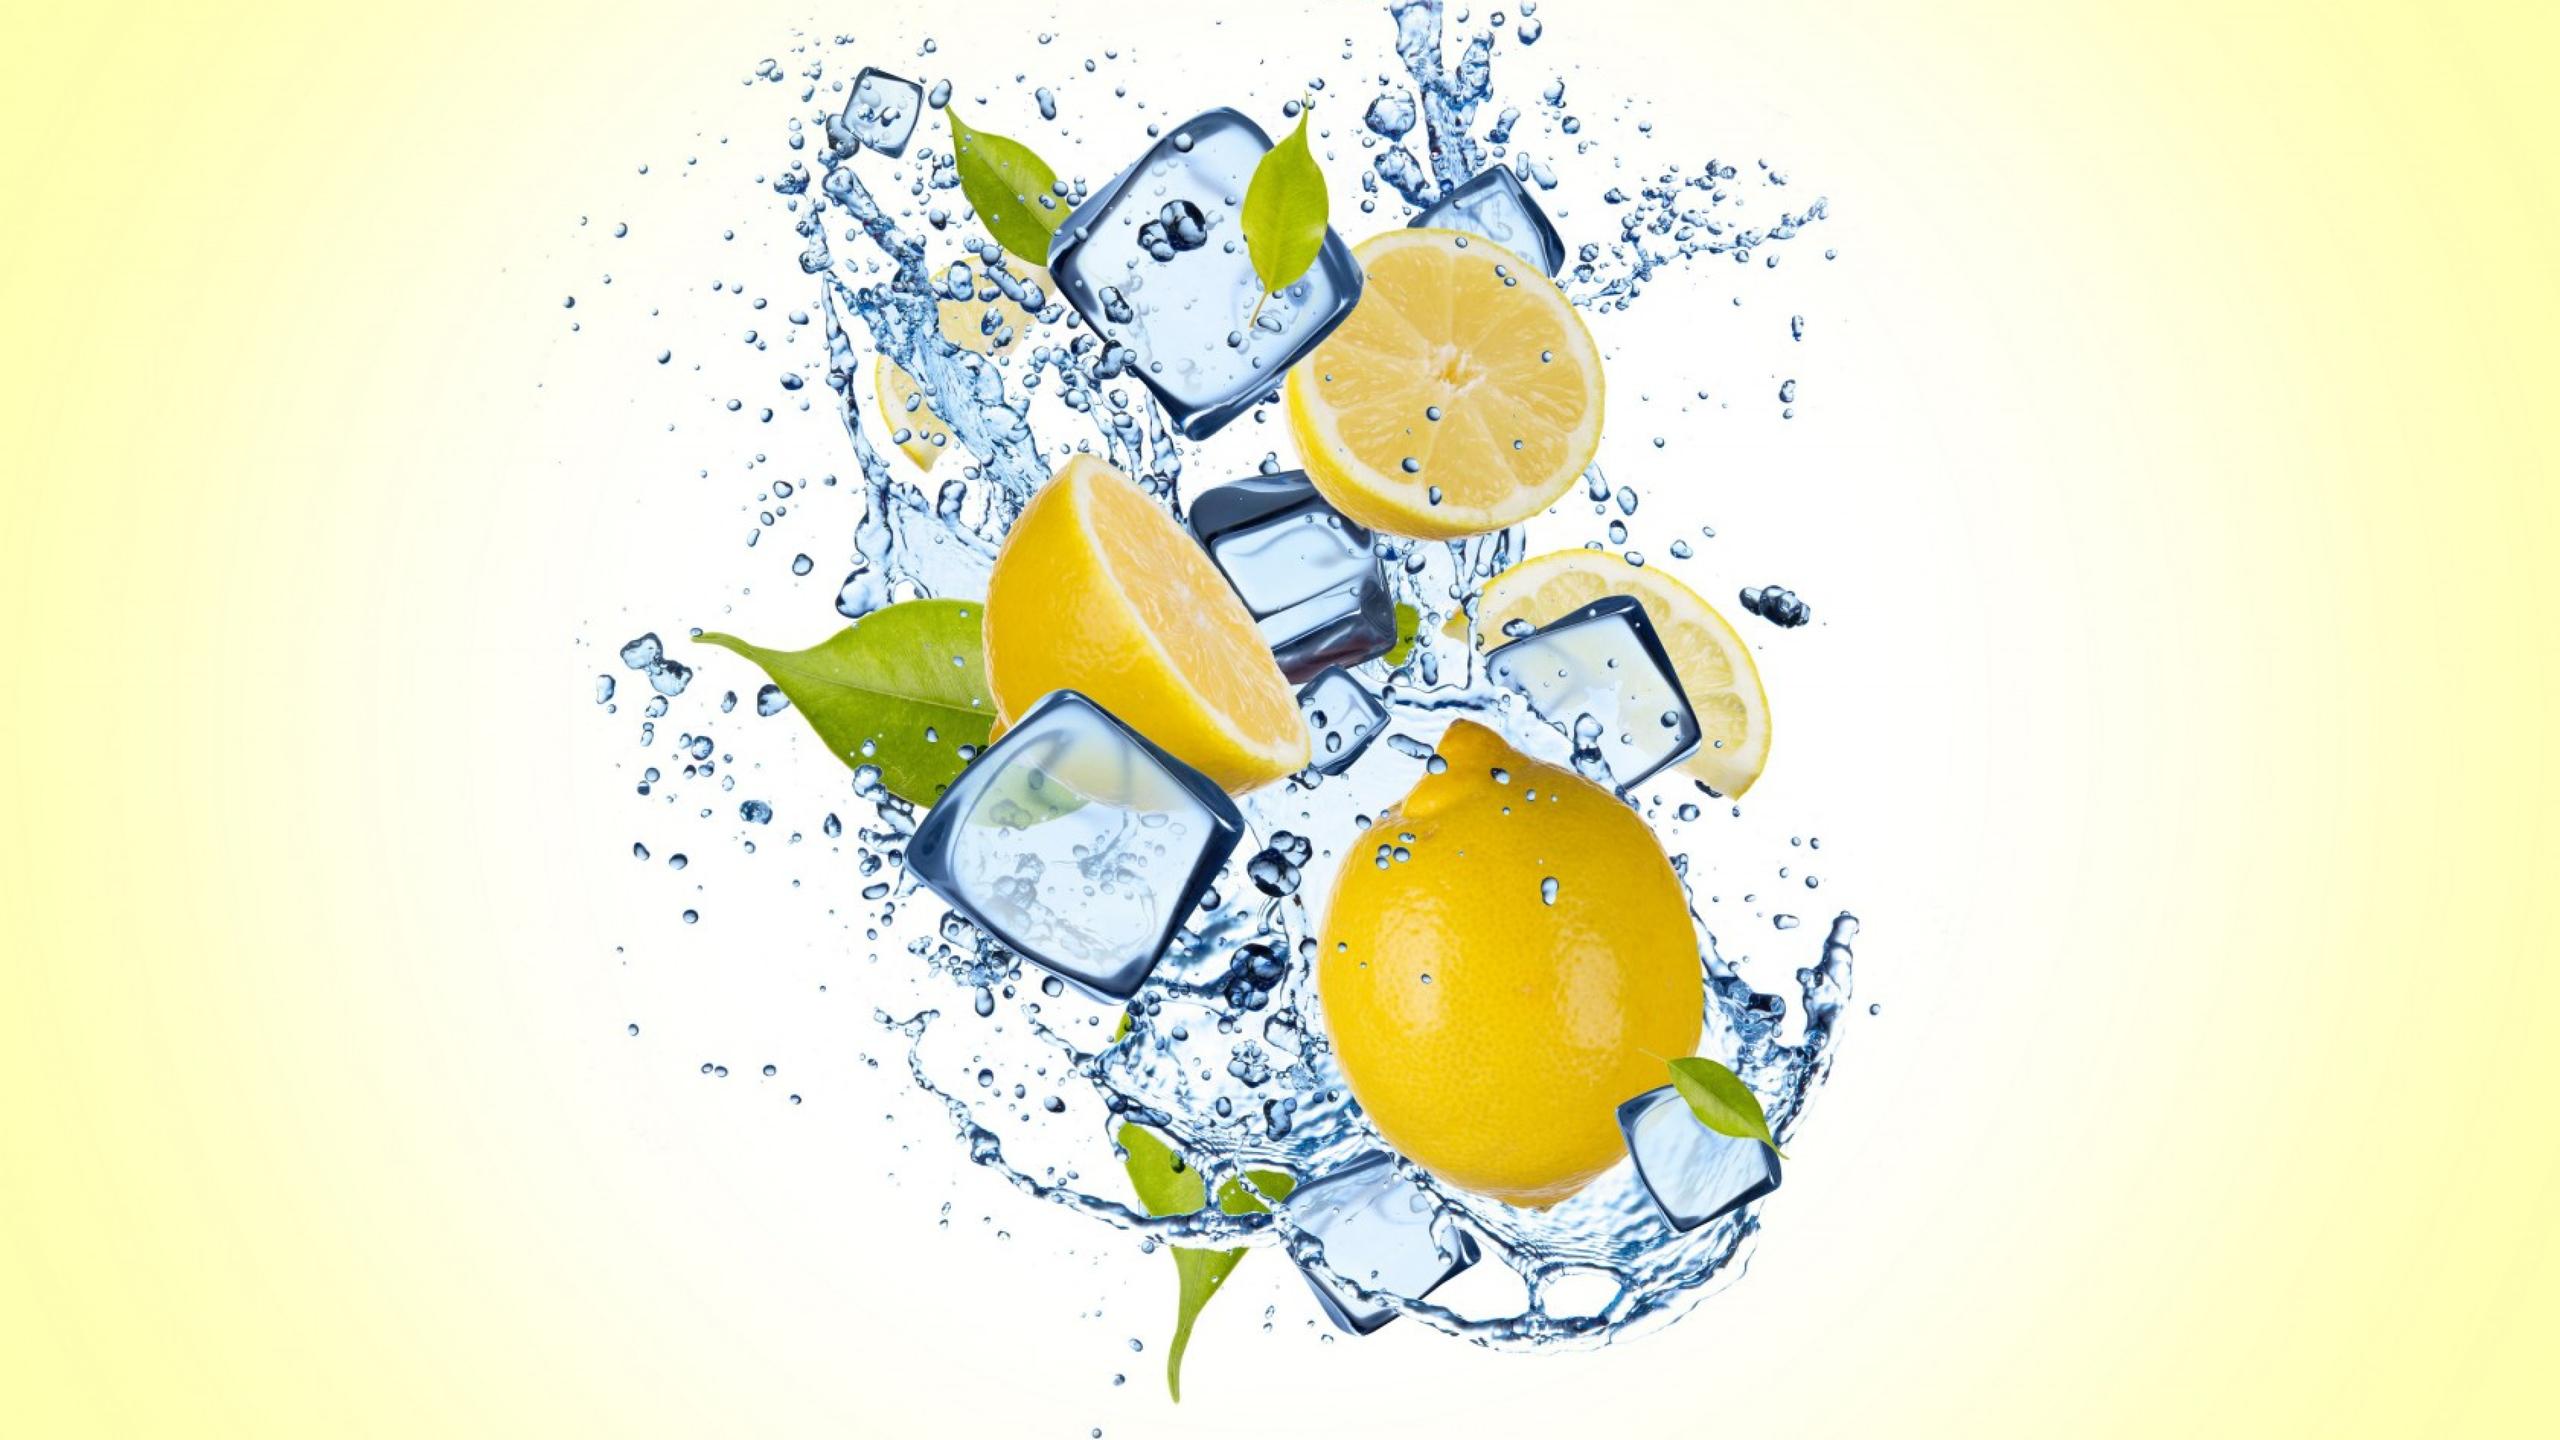 2560x1440 Lemon Ice Splash 1440p Resolution Hd 4k Wallpapers